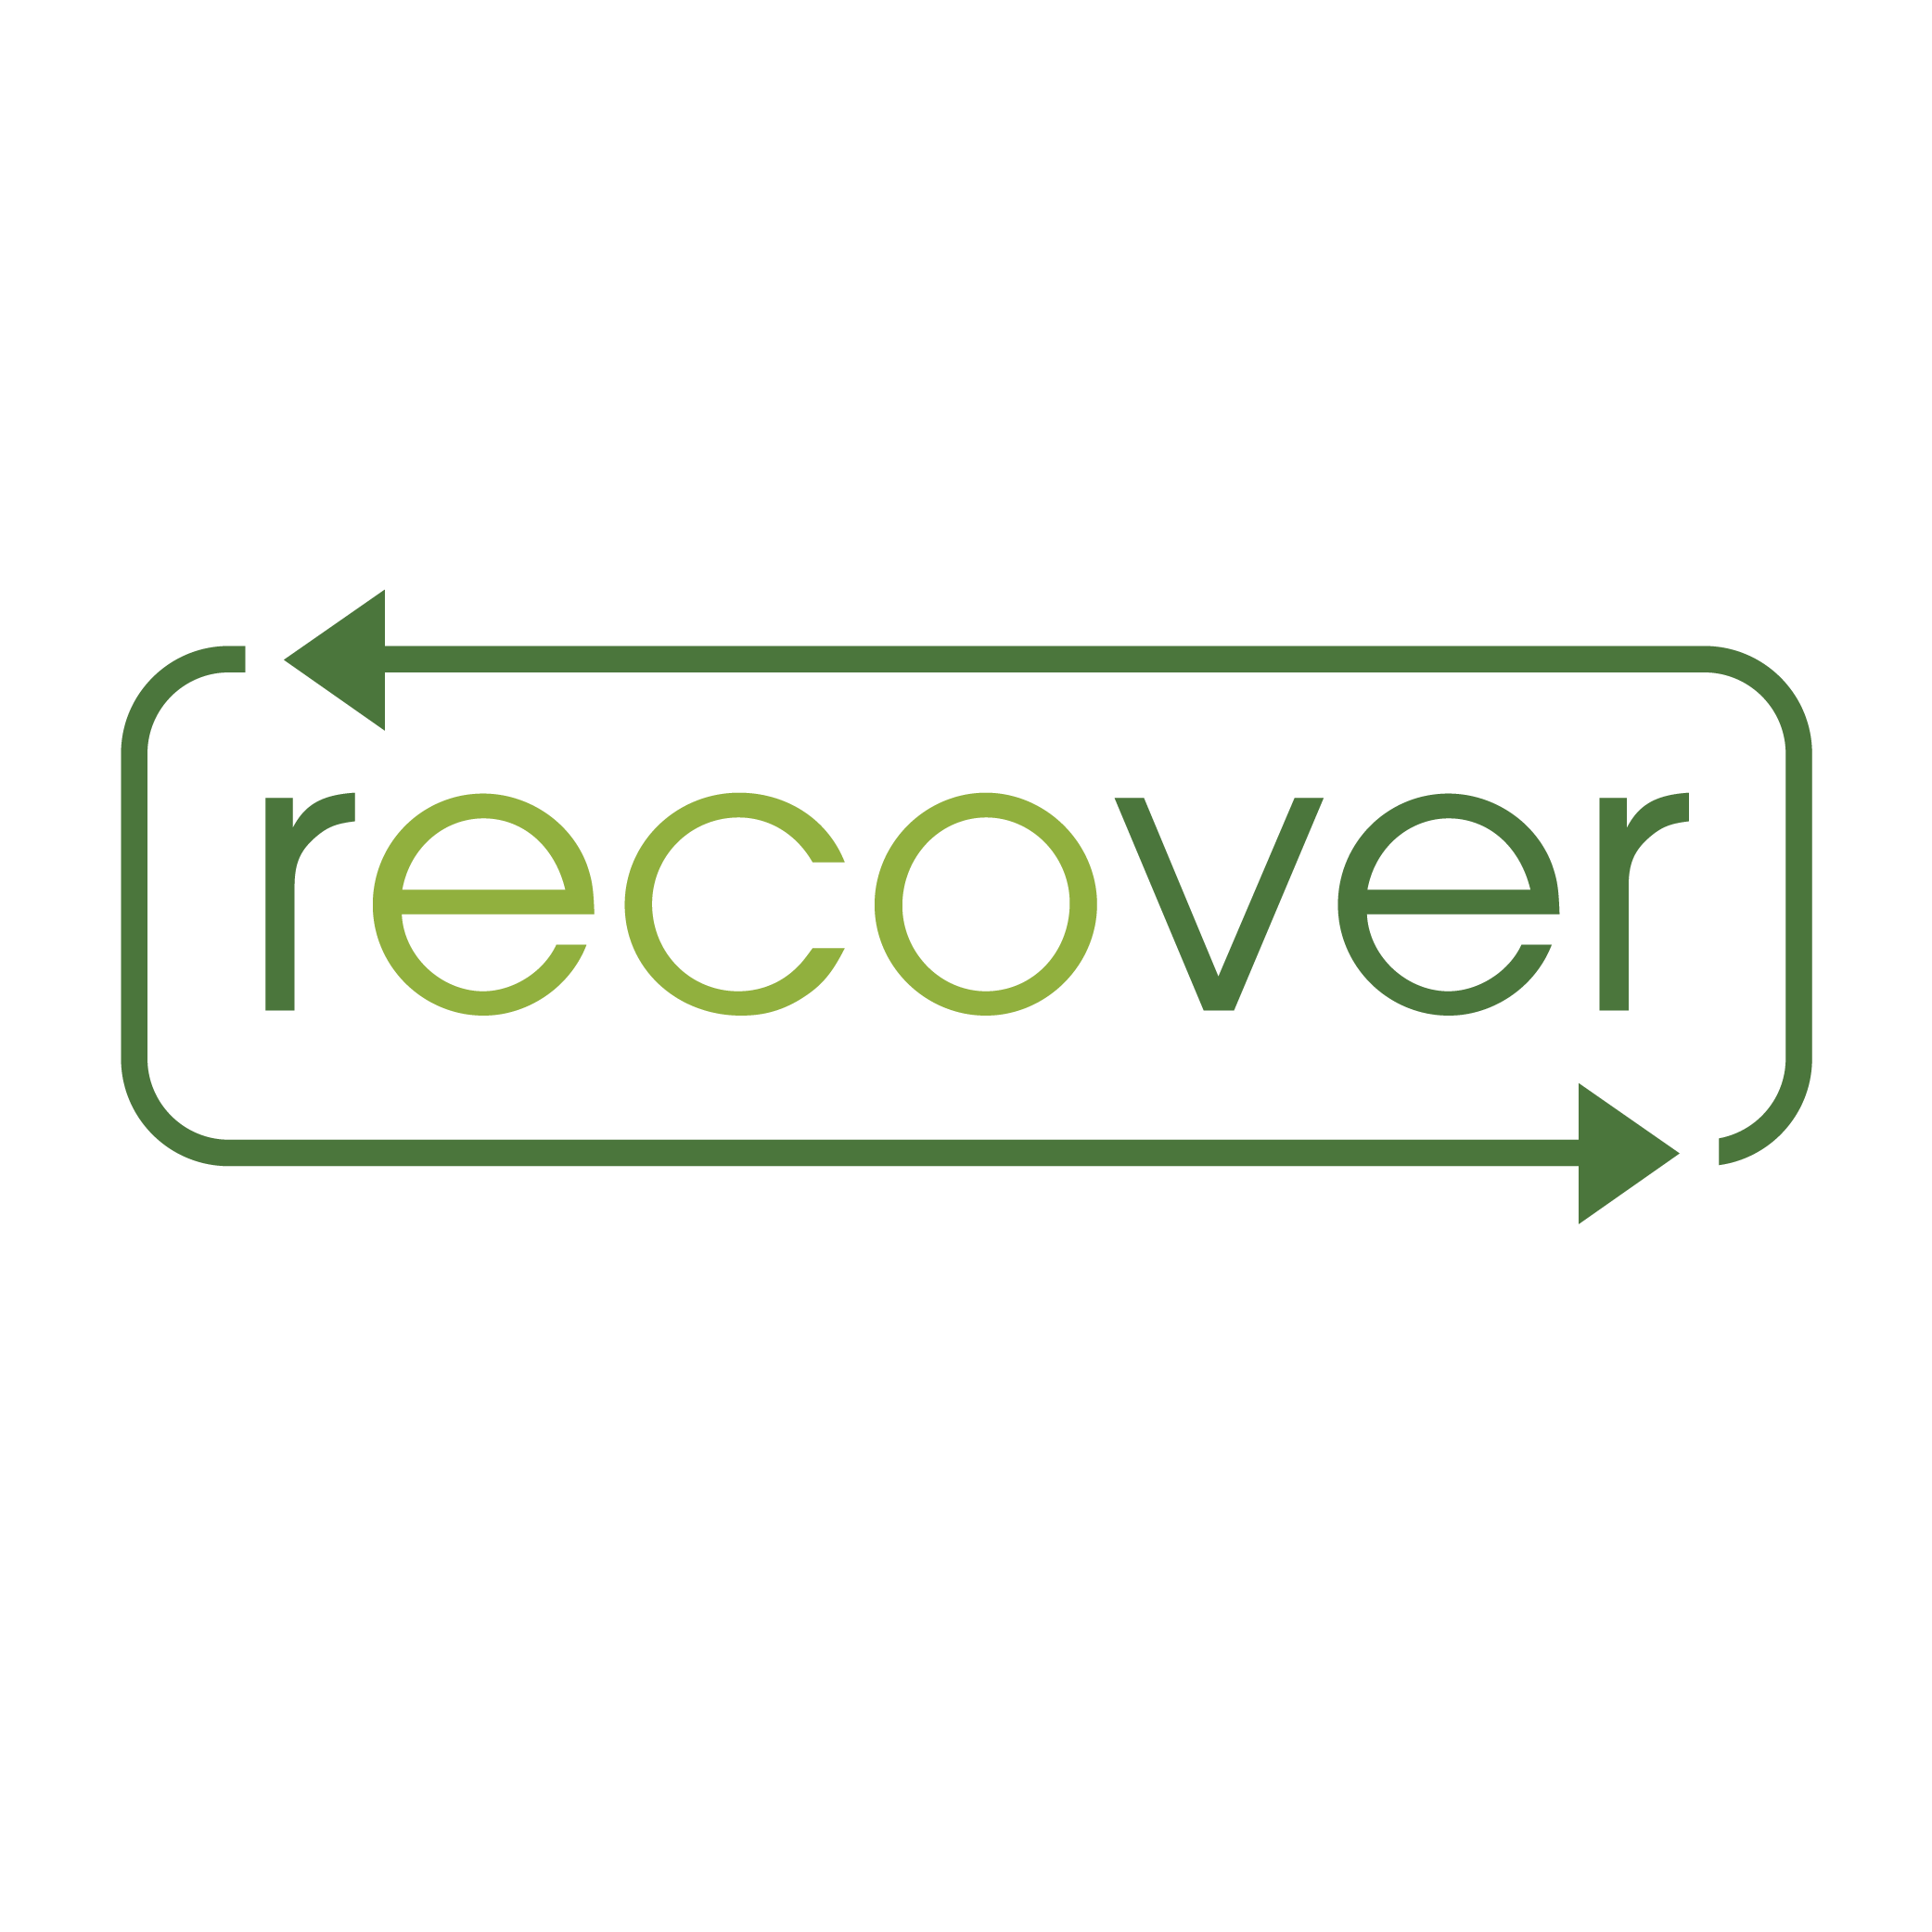 RecoverLogo-01.png